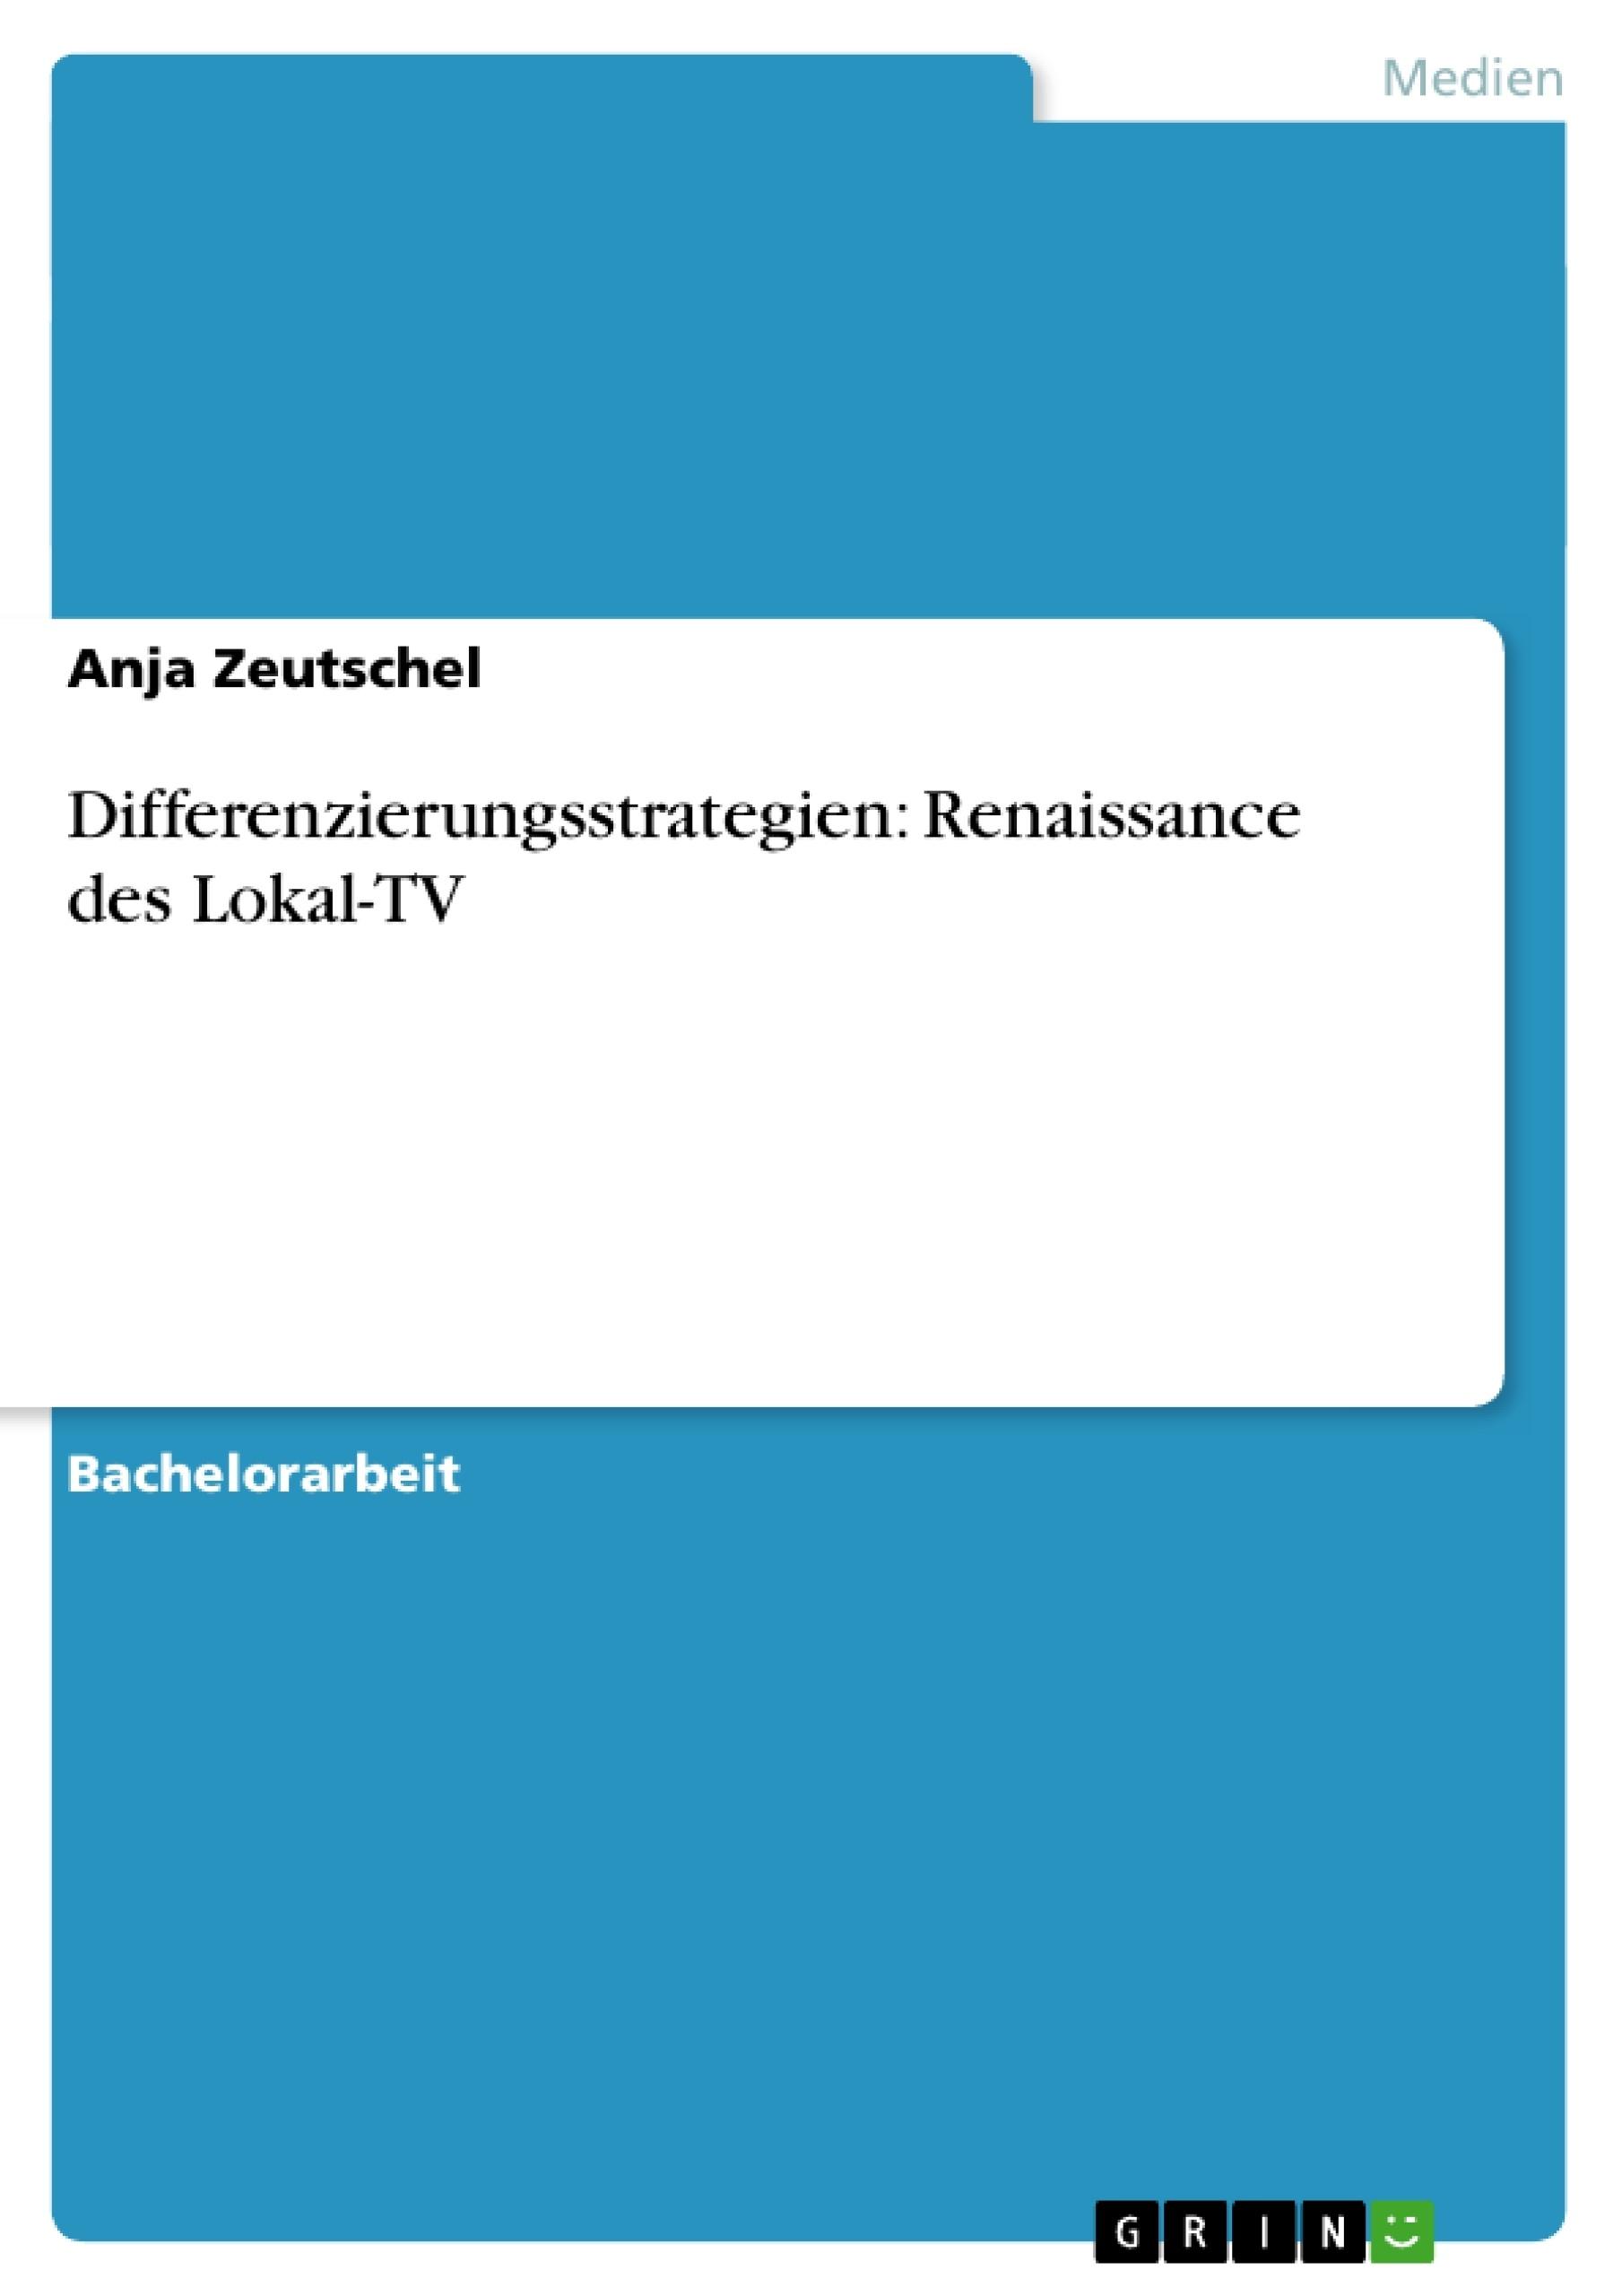 Titel: Differenzierungsstrategien: Renaissance des Lokal-TV